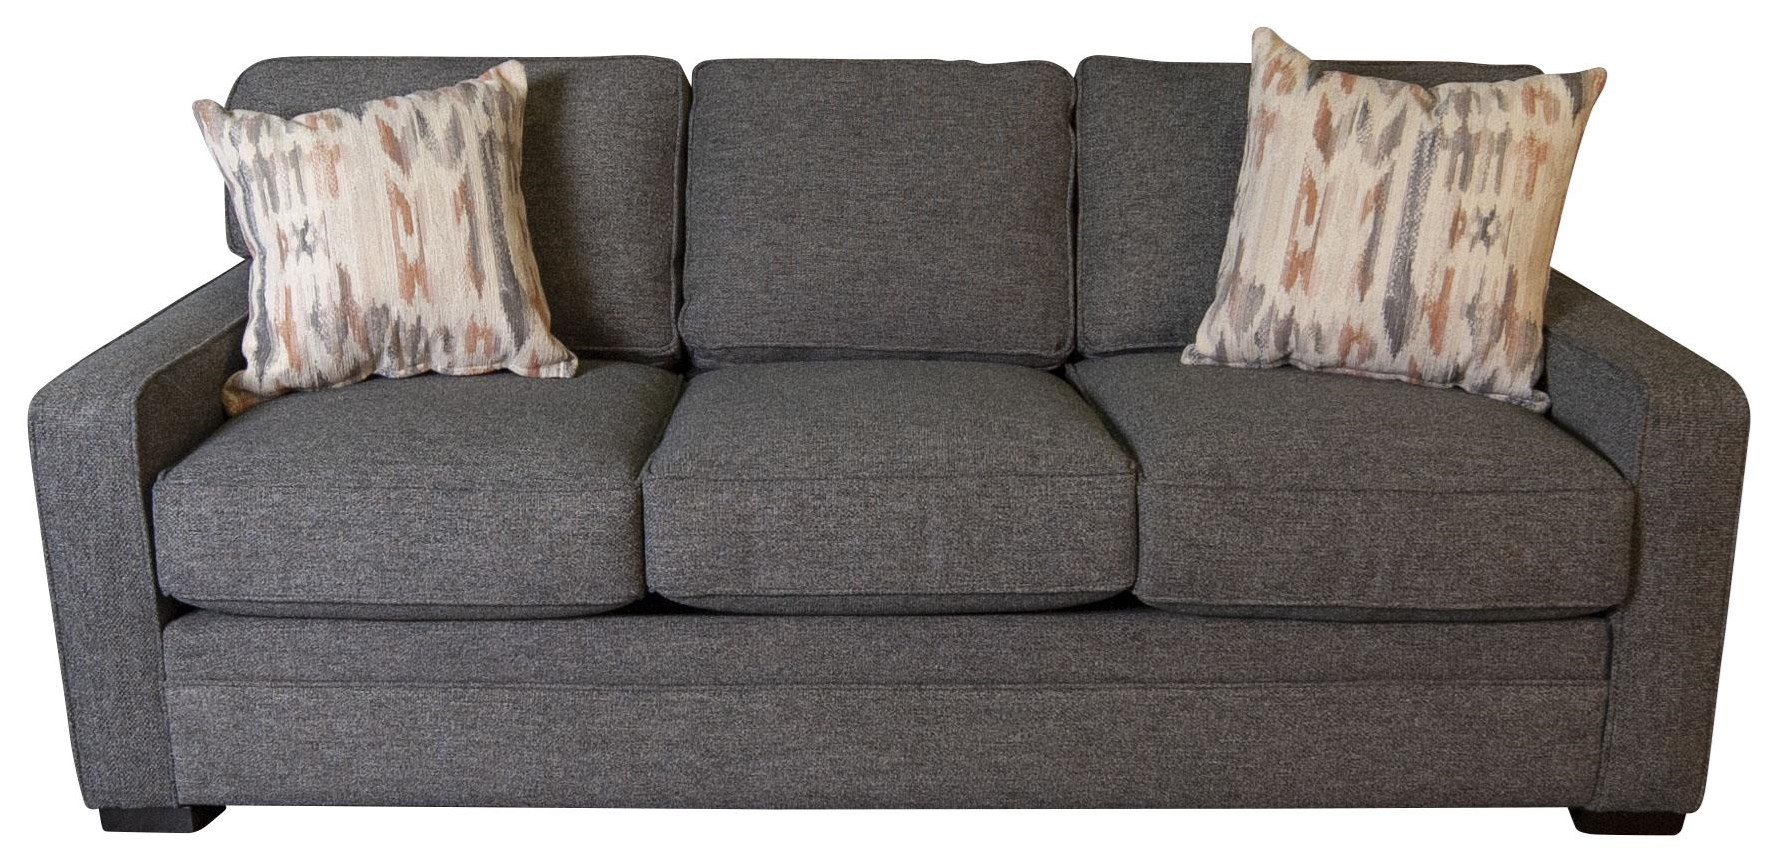 Eddie Eddie Sofa with Accent Pillows by Jonathan Louis at Morris Home